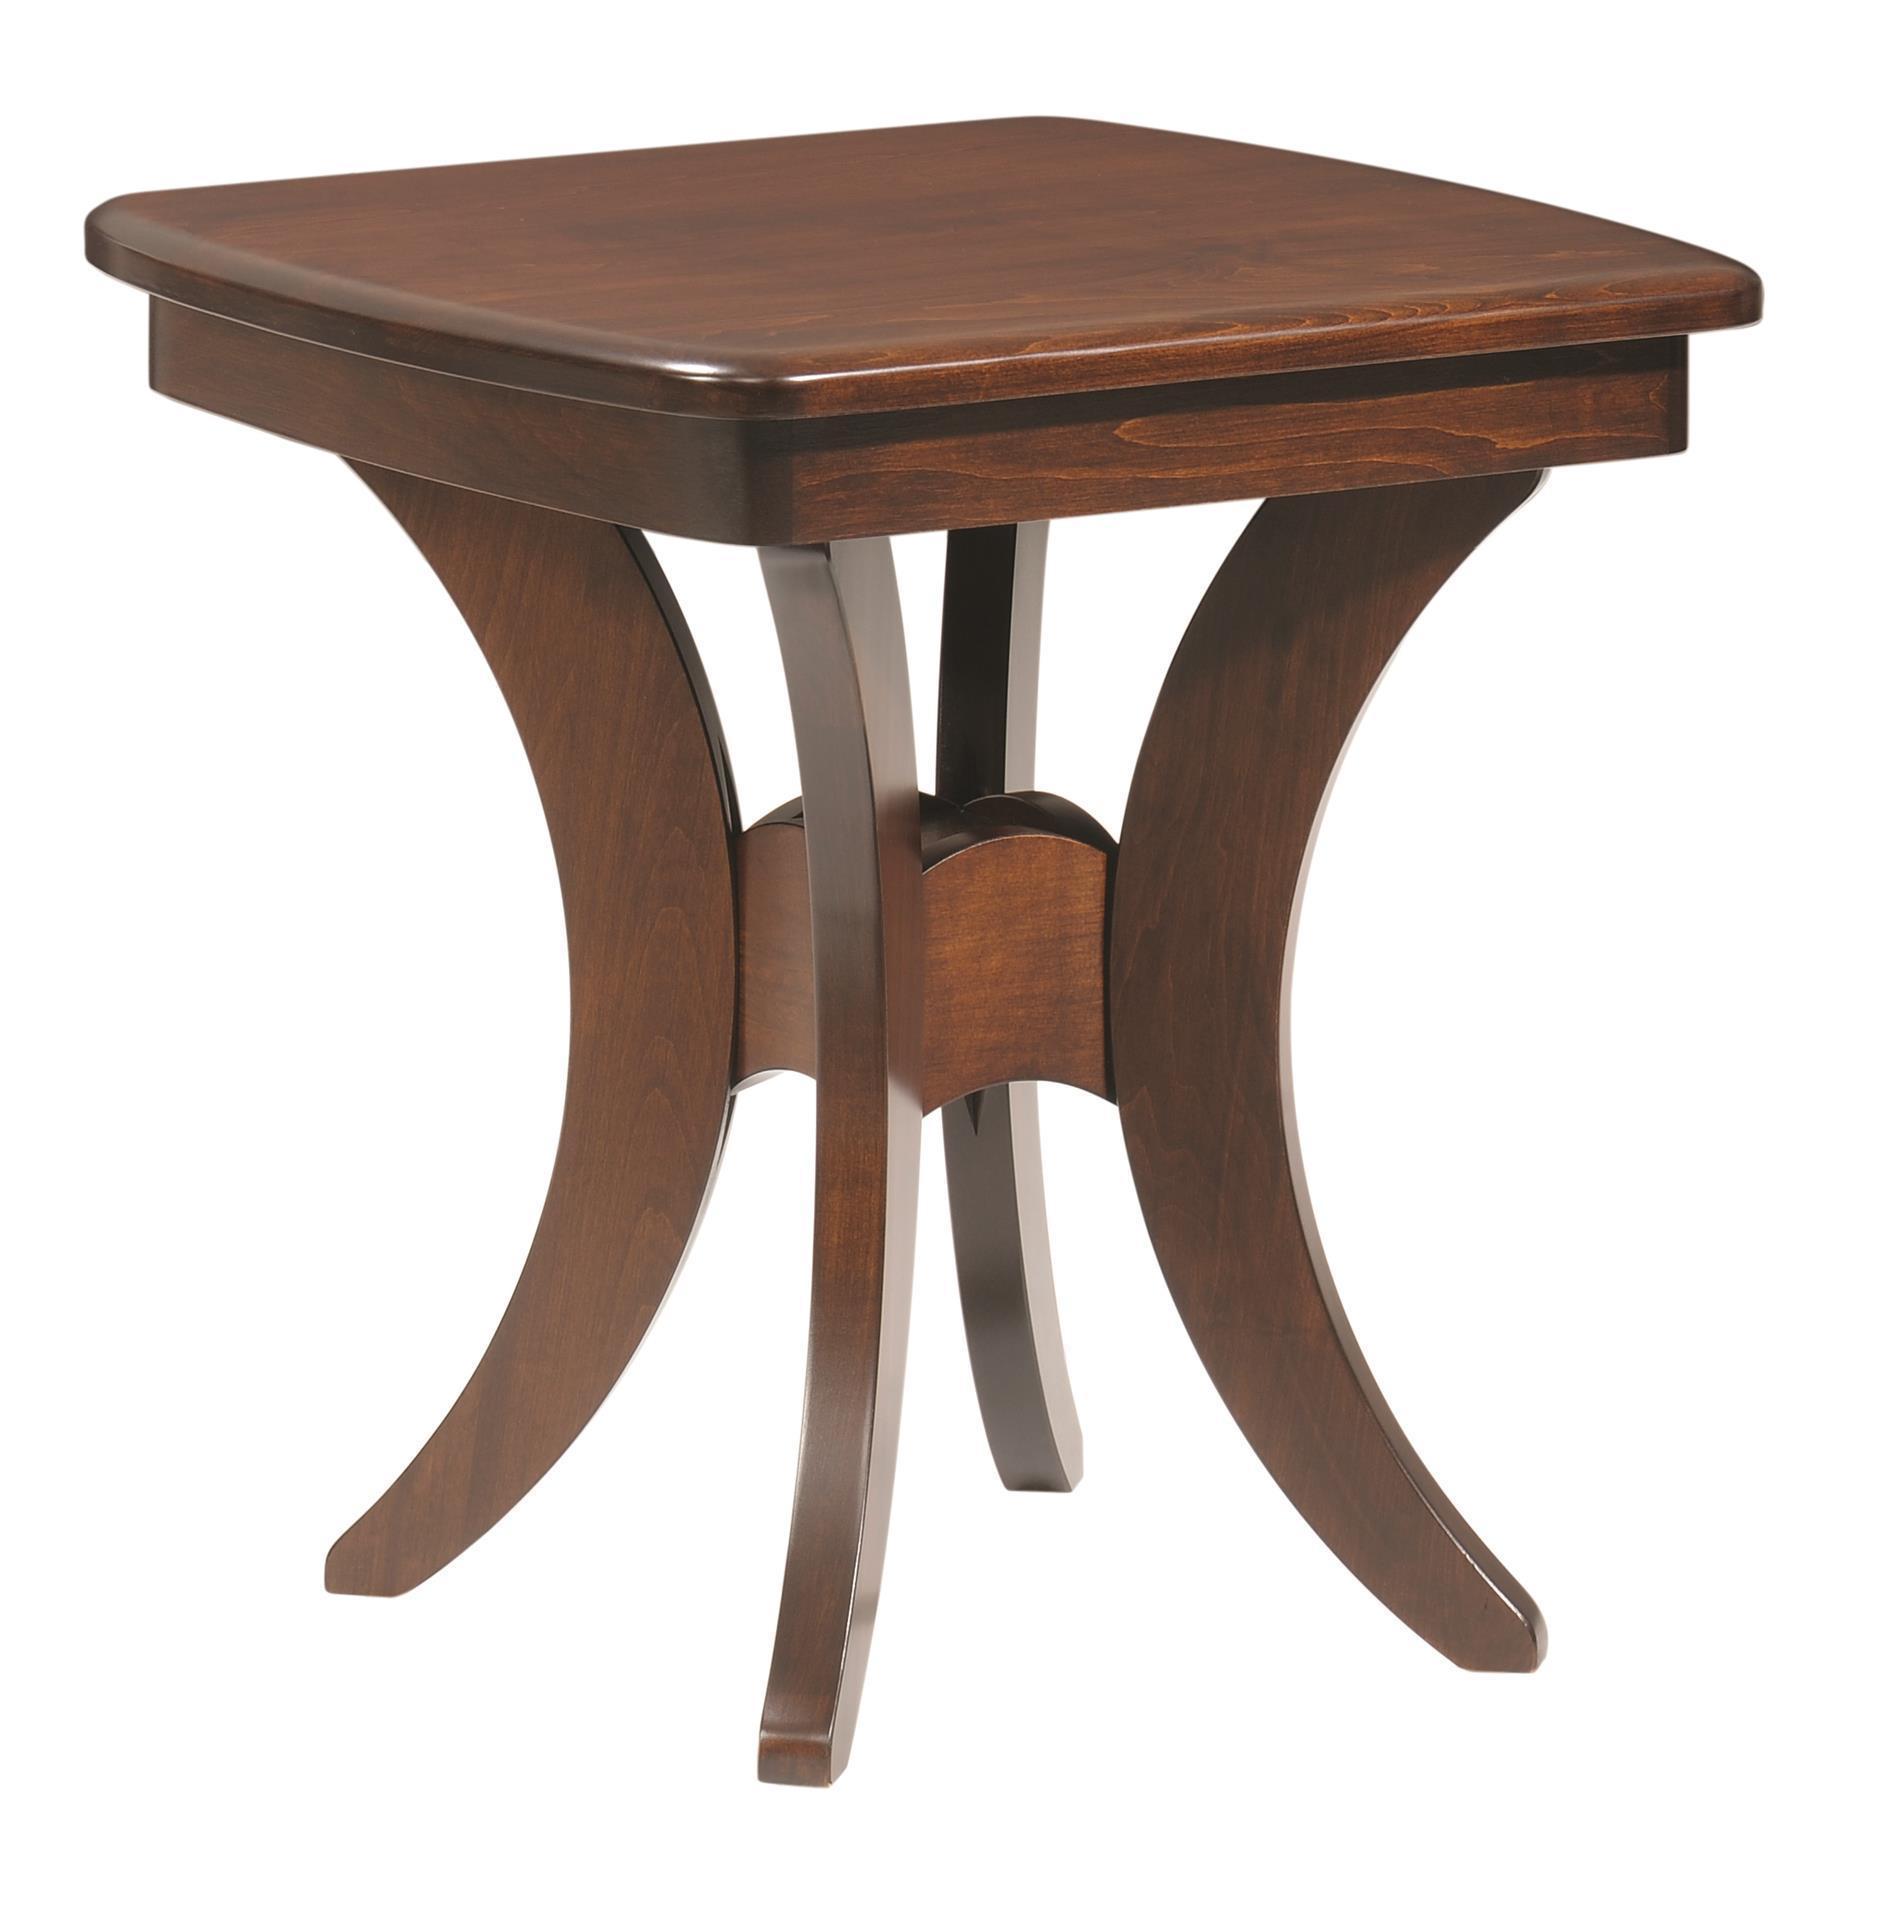 Amish furniture of bristol - Bristol Cross End Table